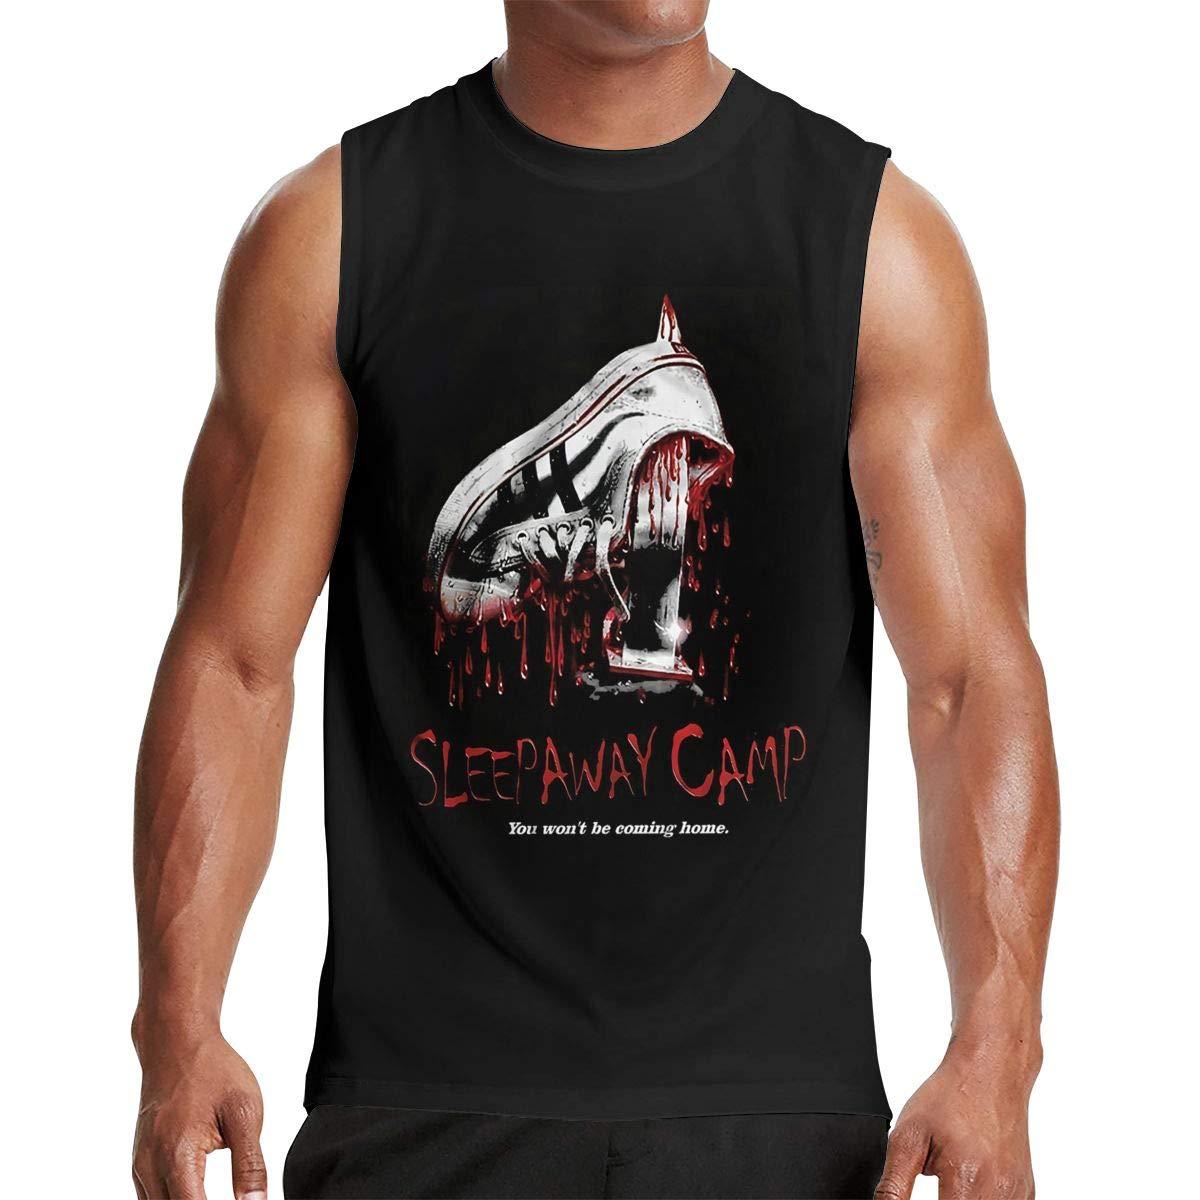 Thomlarryca Sleepaway Camp S Gym Muscle T Shirt Classic Athletic Sleeveless T Shirts B